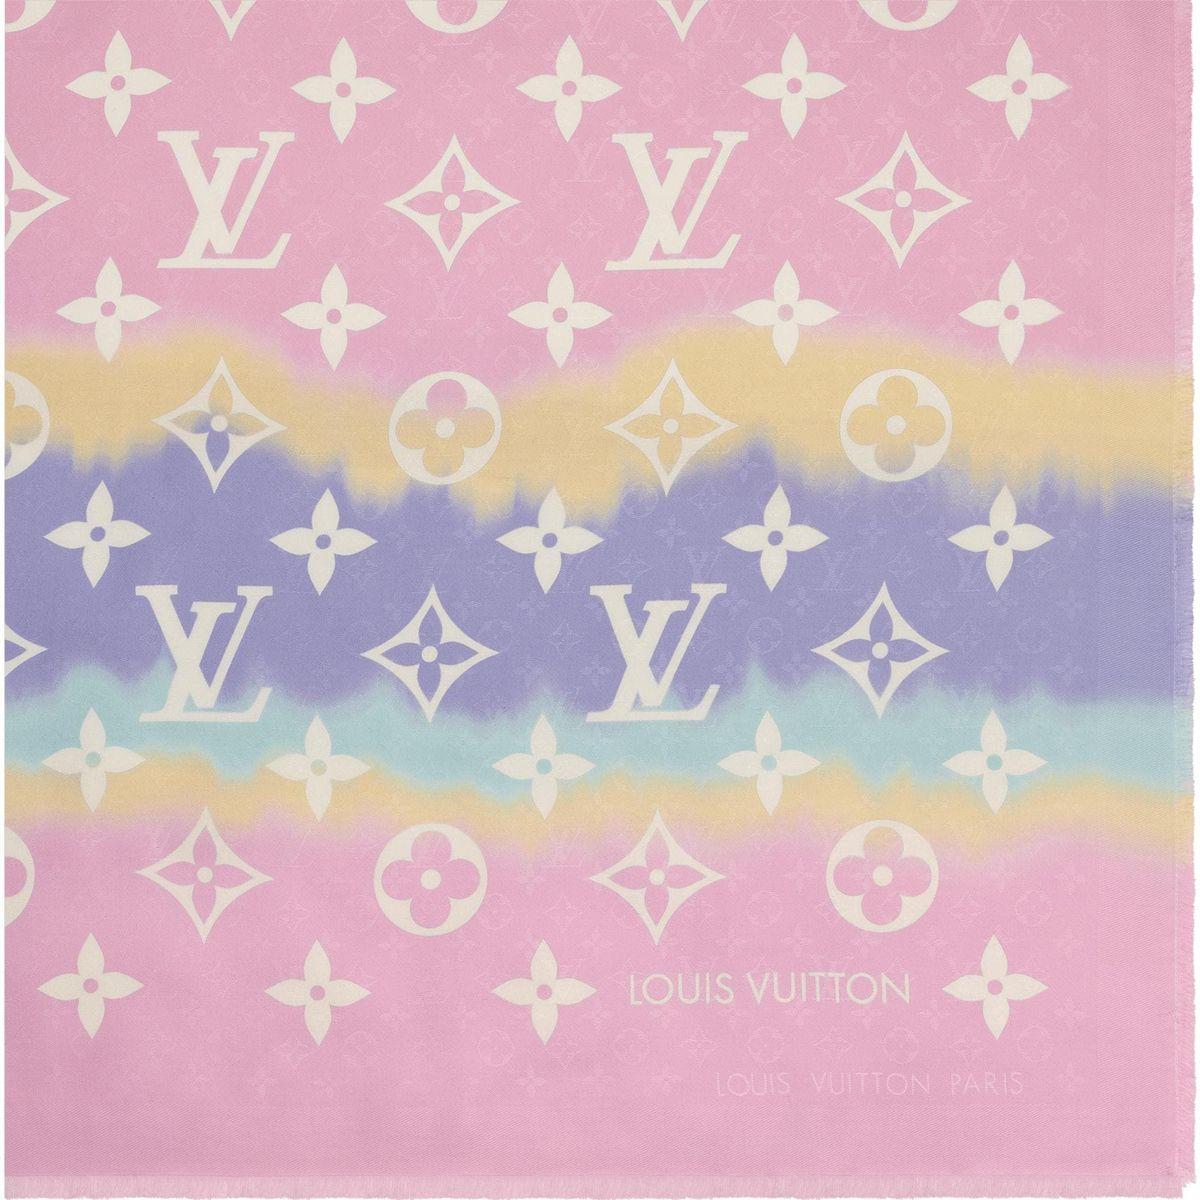 Liketoknow It In 2021 Louis Vuitton Iphone Wallpaper Monogram Wallpaper Louis Vuitton Background